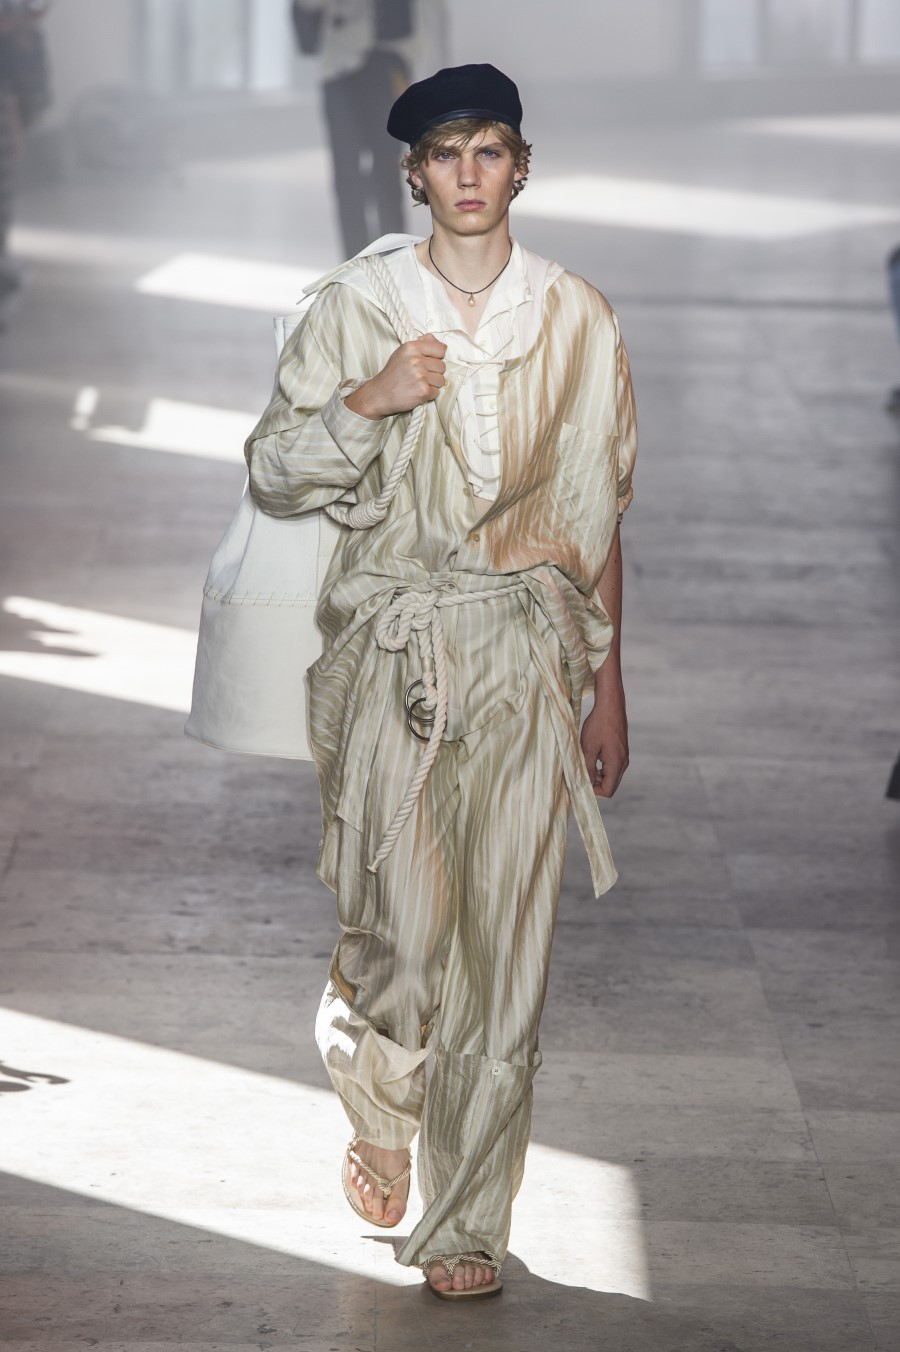 Ann Demeulemeester - Printemps-Été 2020 - Paris Fashion Week